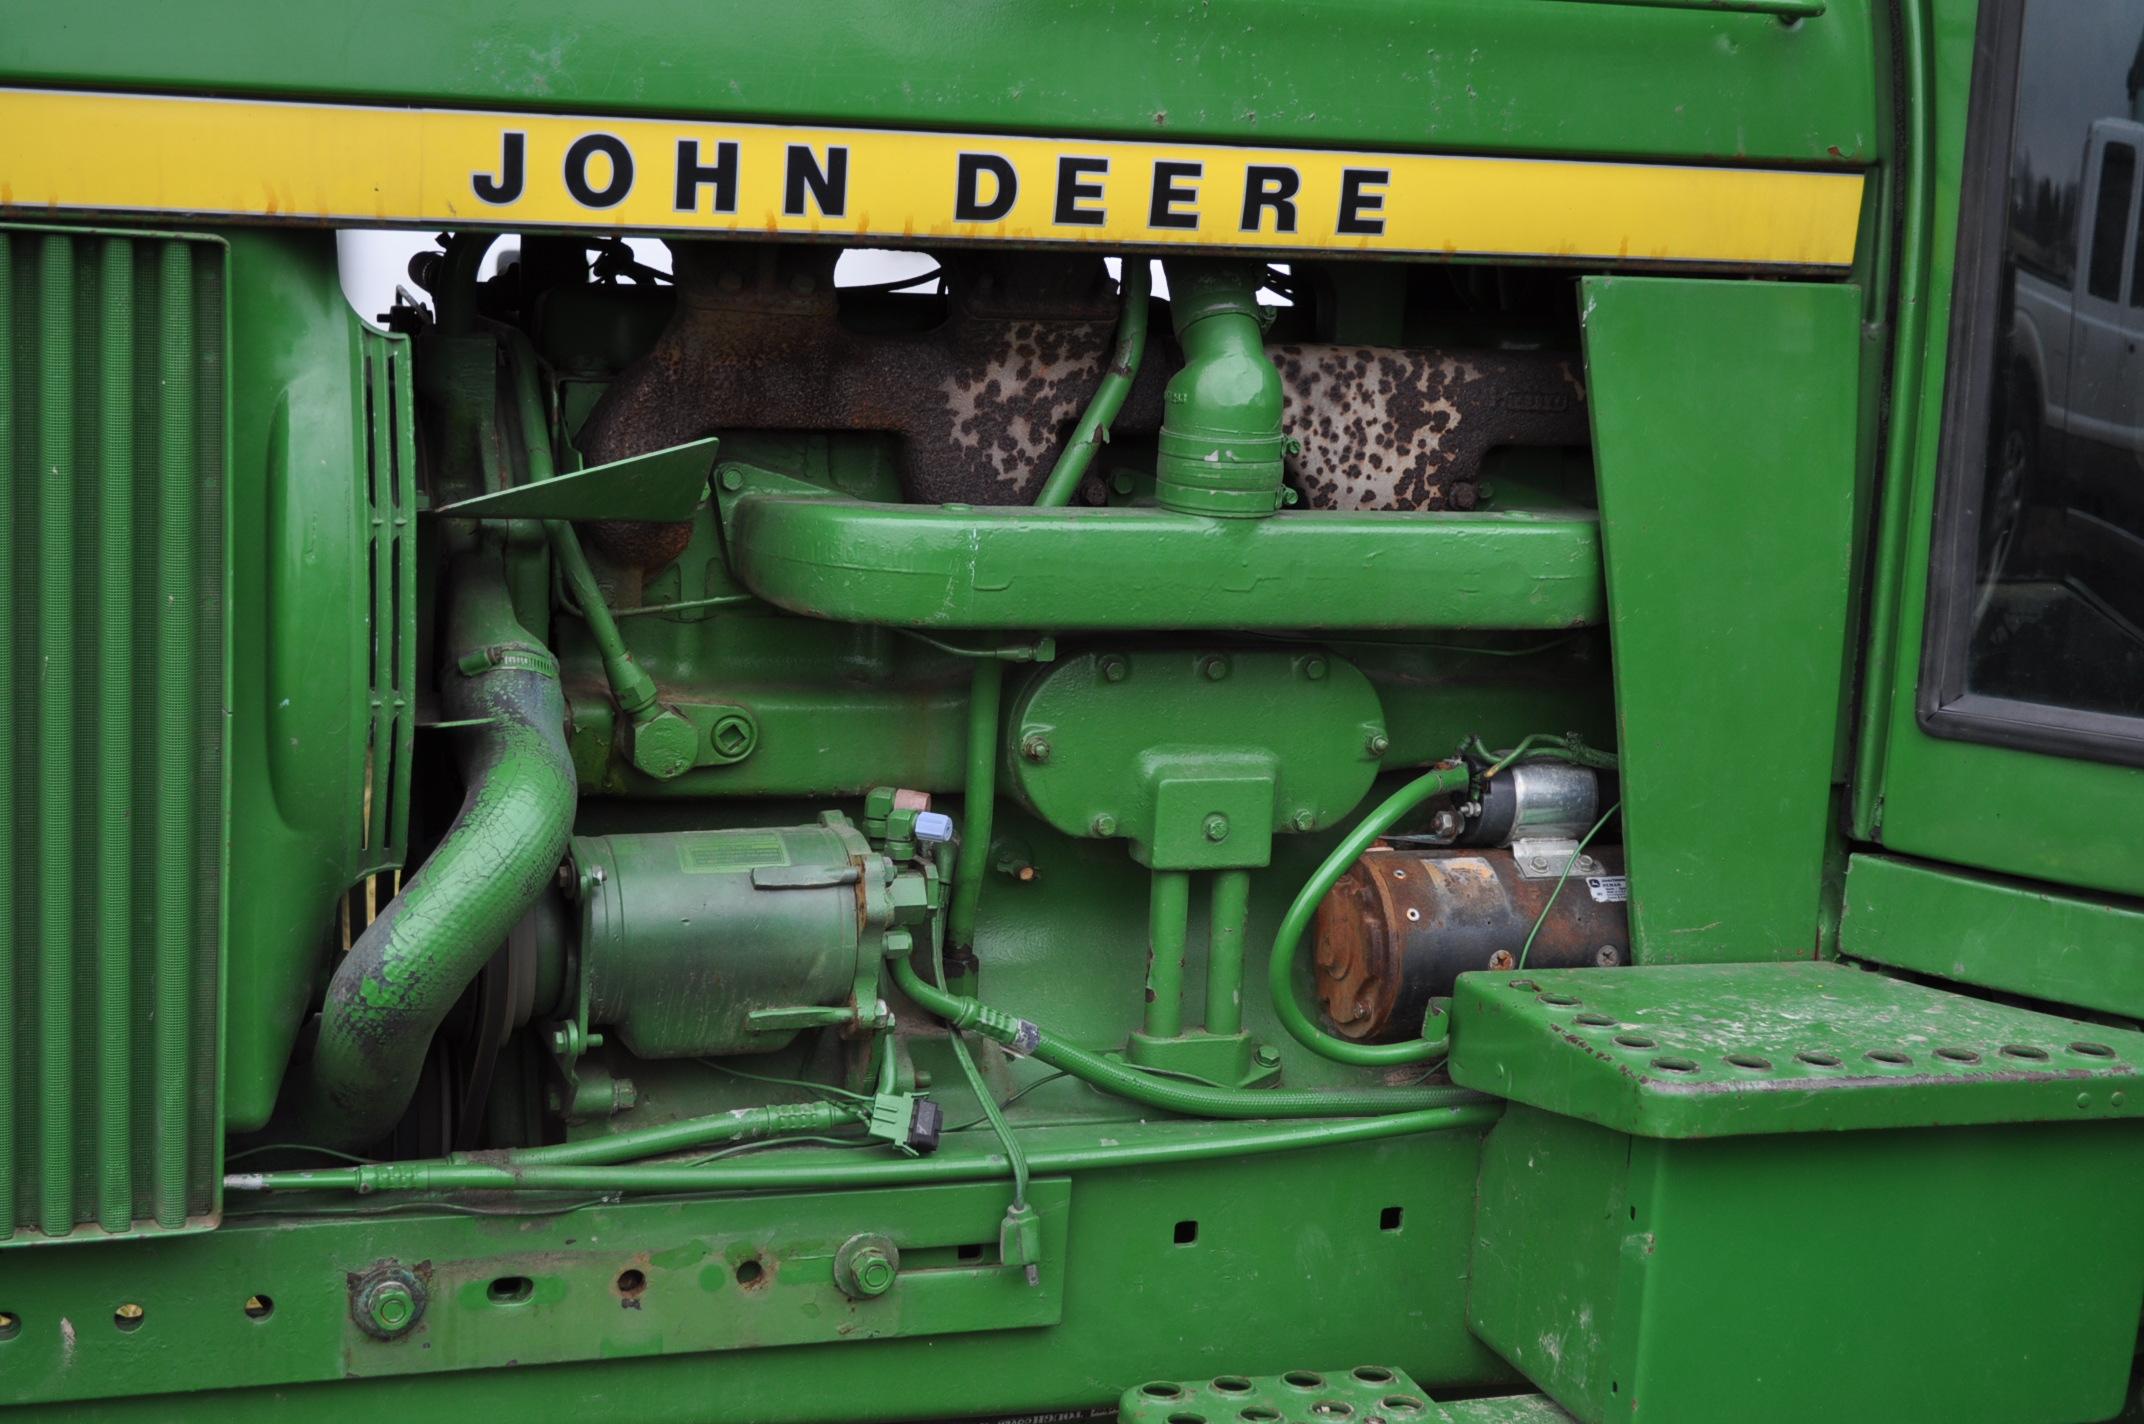 John Deere 4430 tractor, diesel, 18.4-34 hub duals, 10.00-16 front, CHA, Quad range, 2 hyd - Image 10 of 20